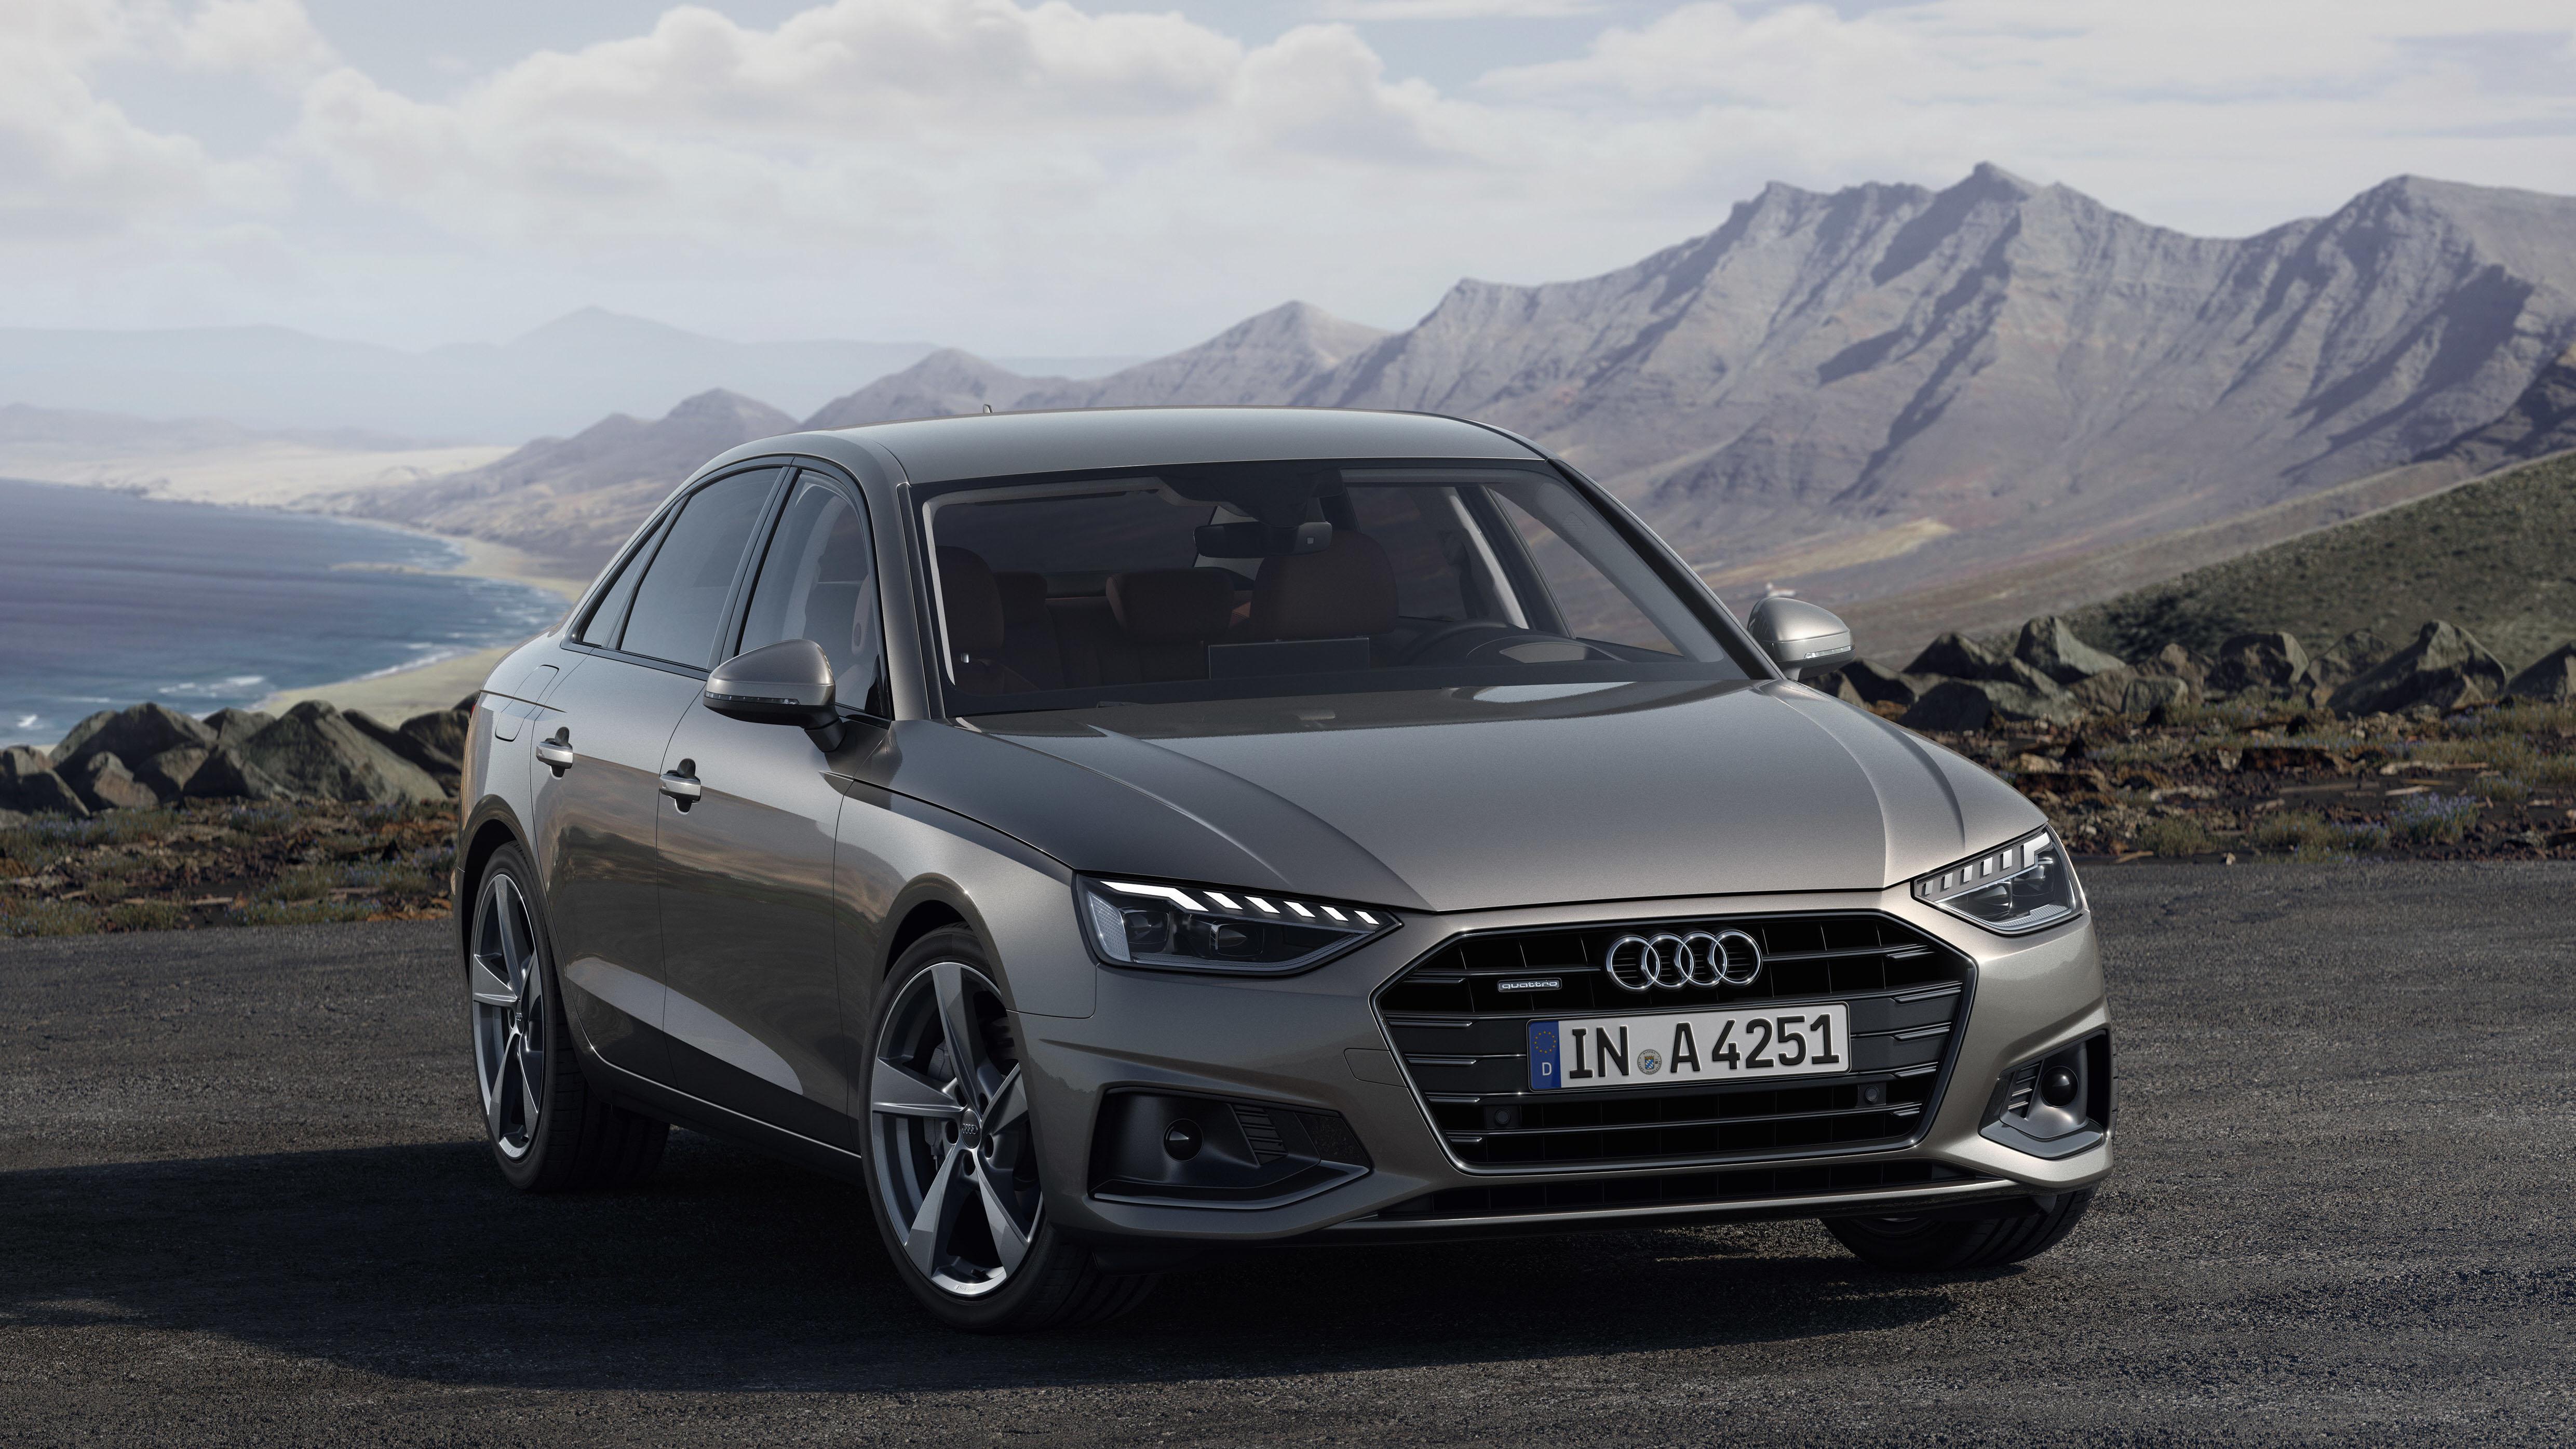 2020 Audi A4 Euro Spec Front Three Quarter